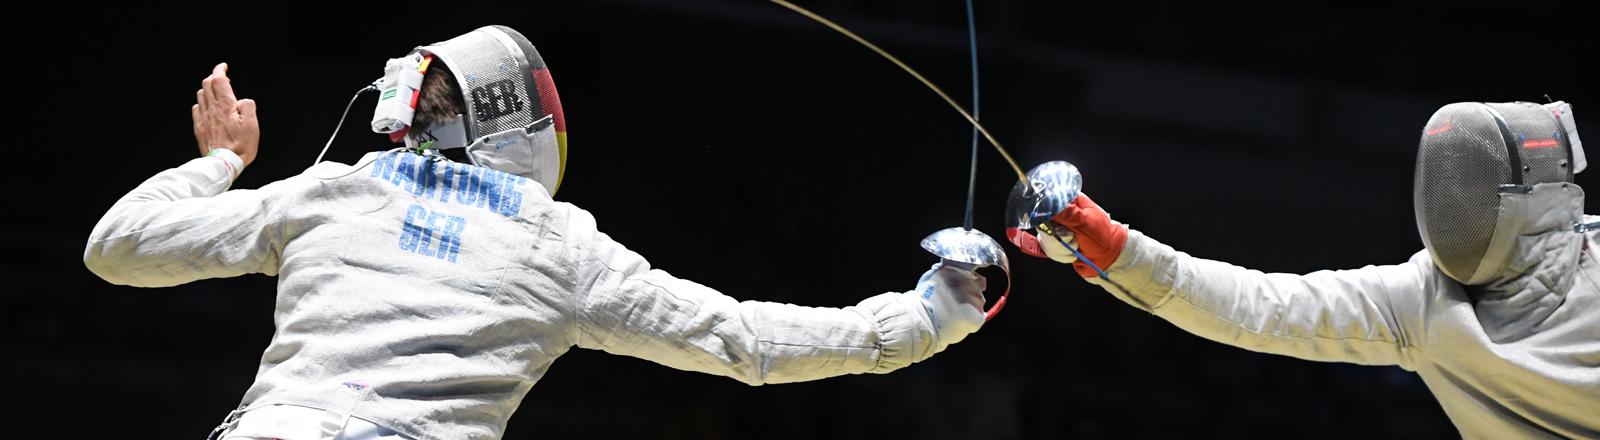 Max Hartung fechtet bei Olympia 2016 in Rio